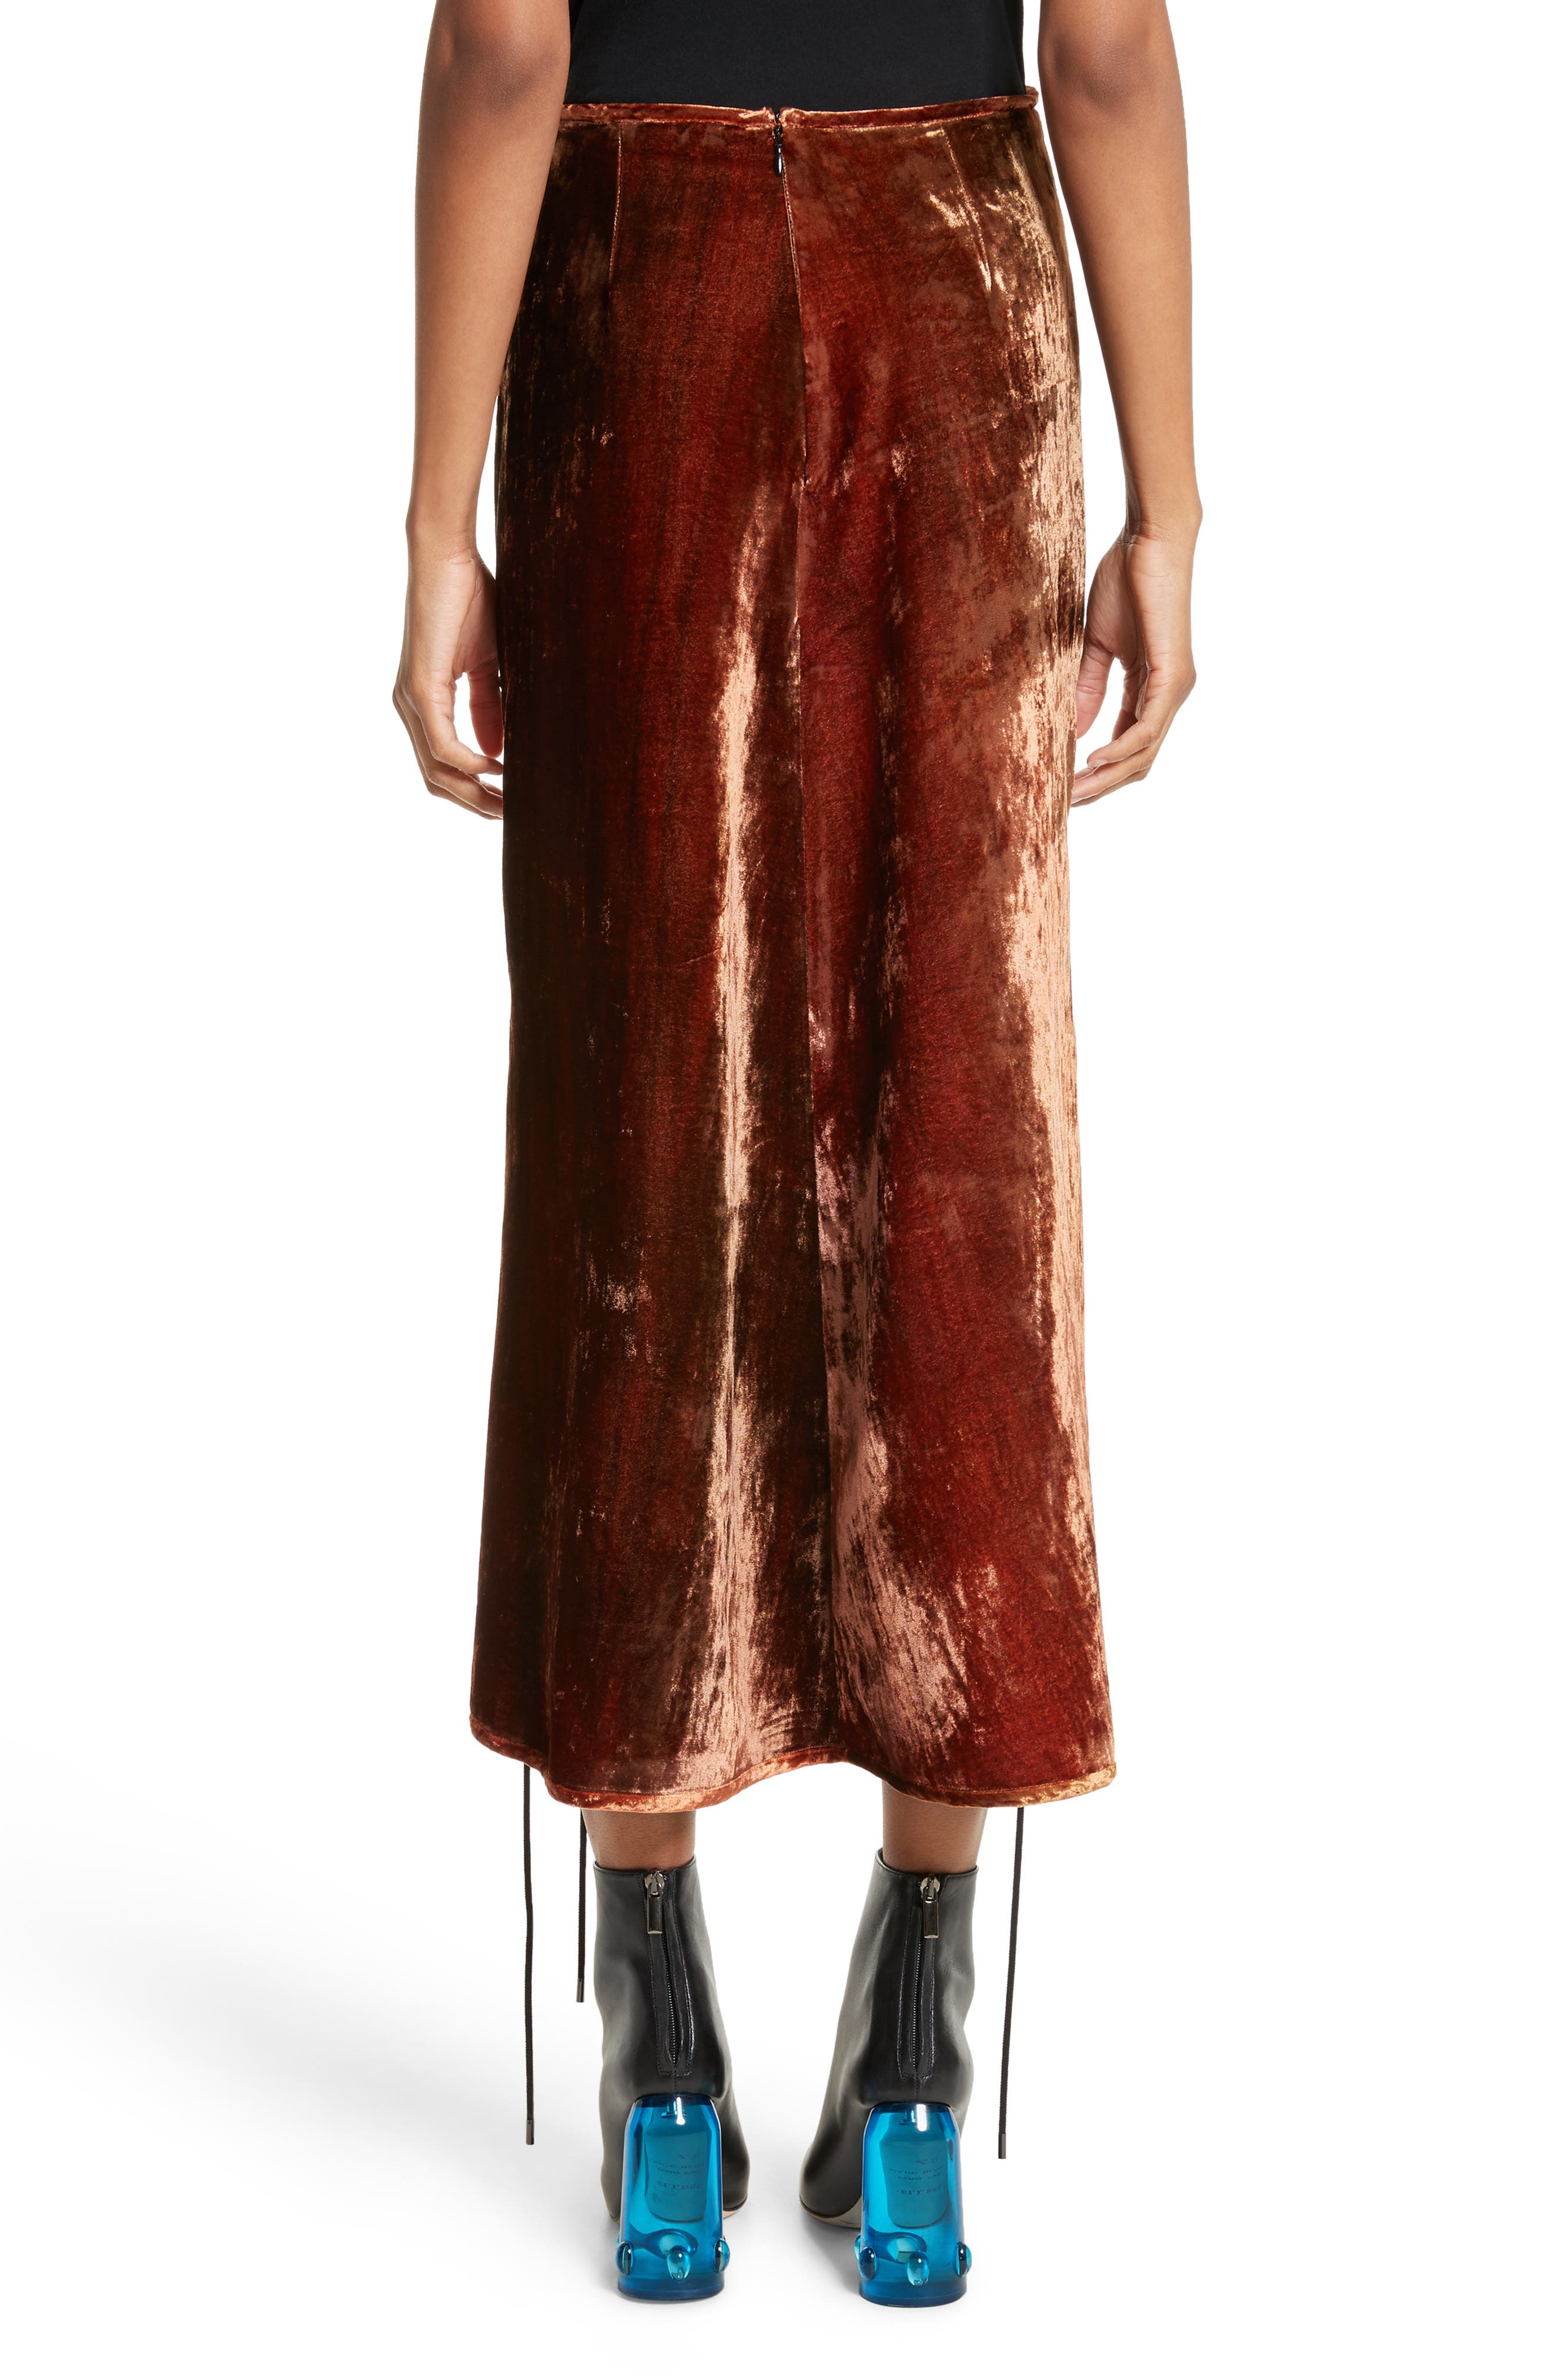 ELLERY, The Blues Lace Up Crushed Velvet Midi Skirt, Alternate thumbnail 2, color, 800